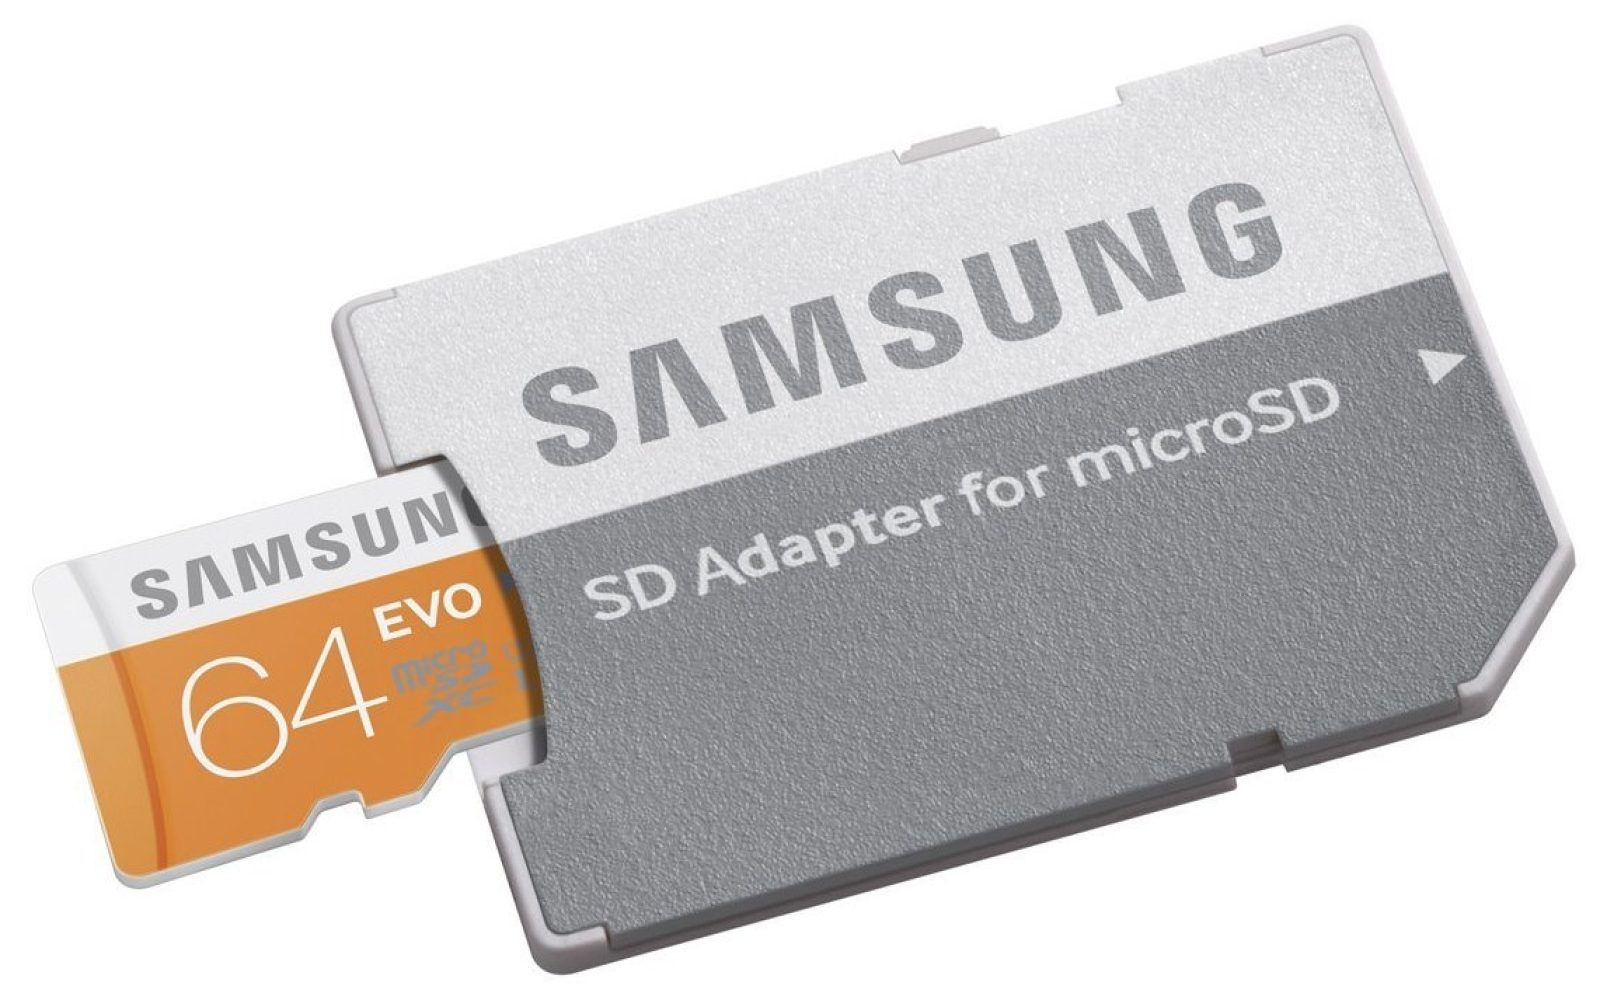 Samsung 64gb Evo Microsd 48mbs Class 10 Memory Card 30